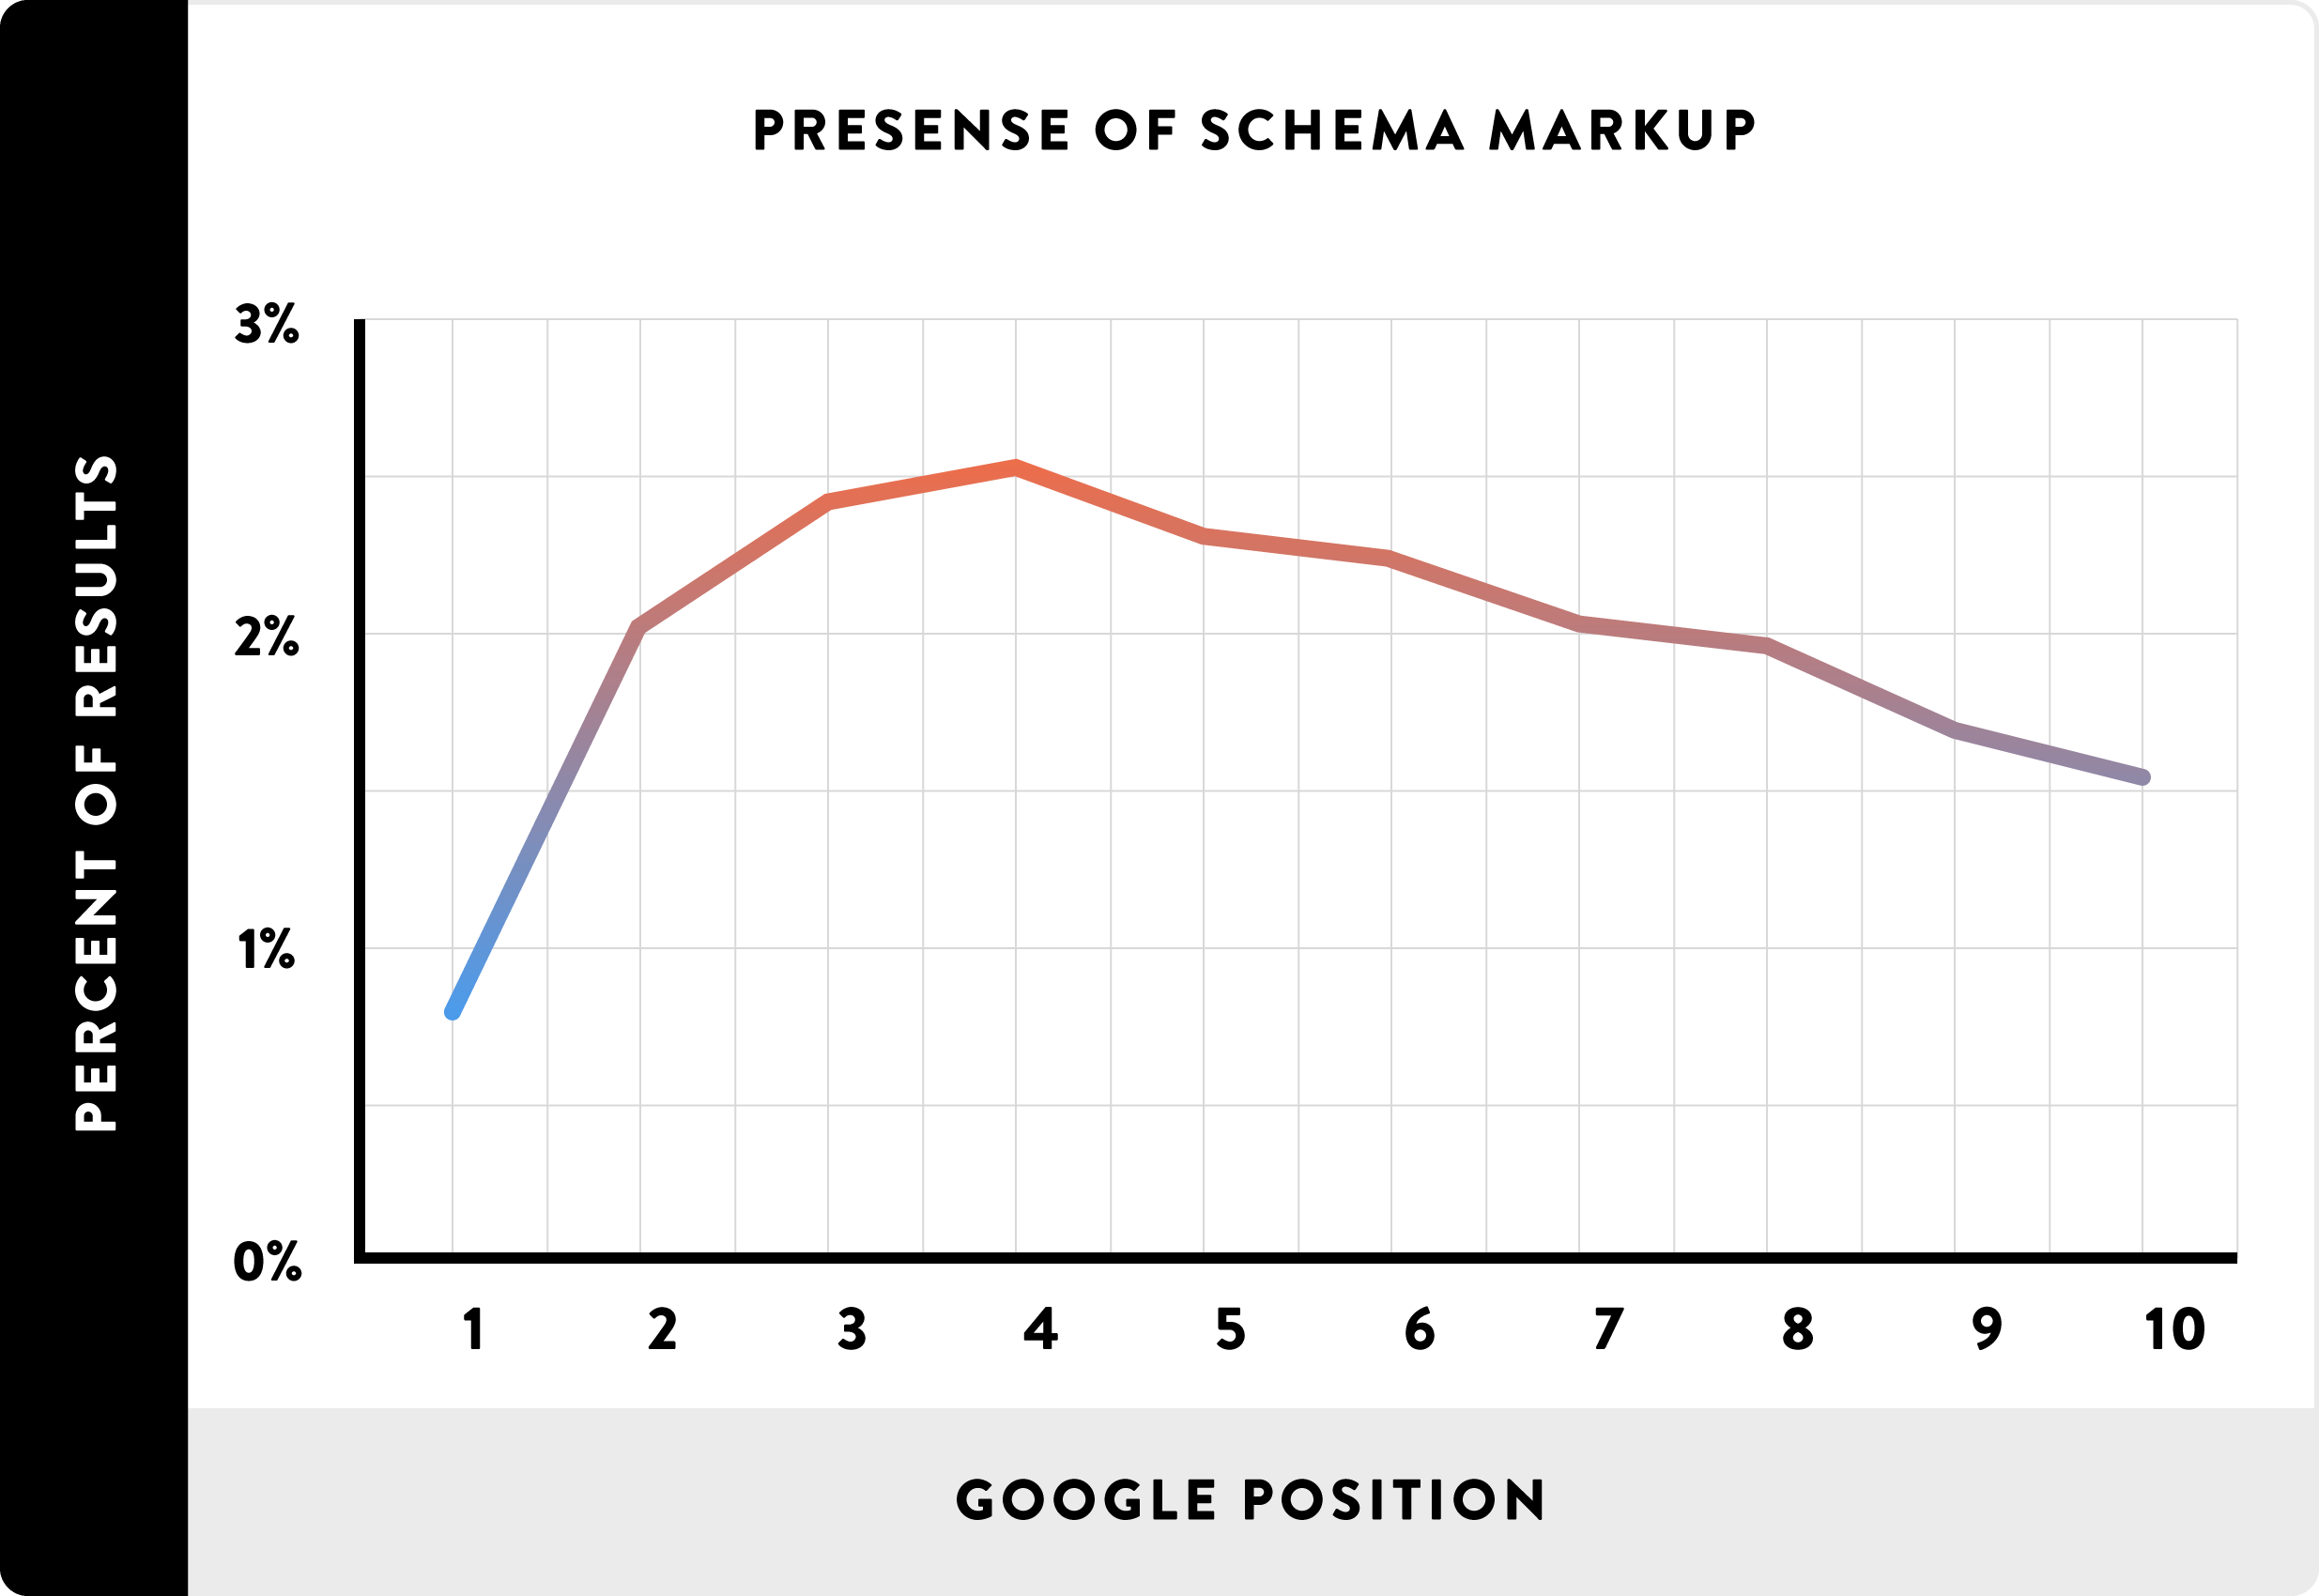 Presense-of-Schema-Markup_line